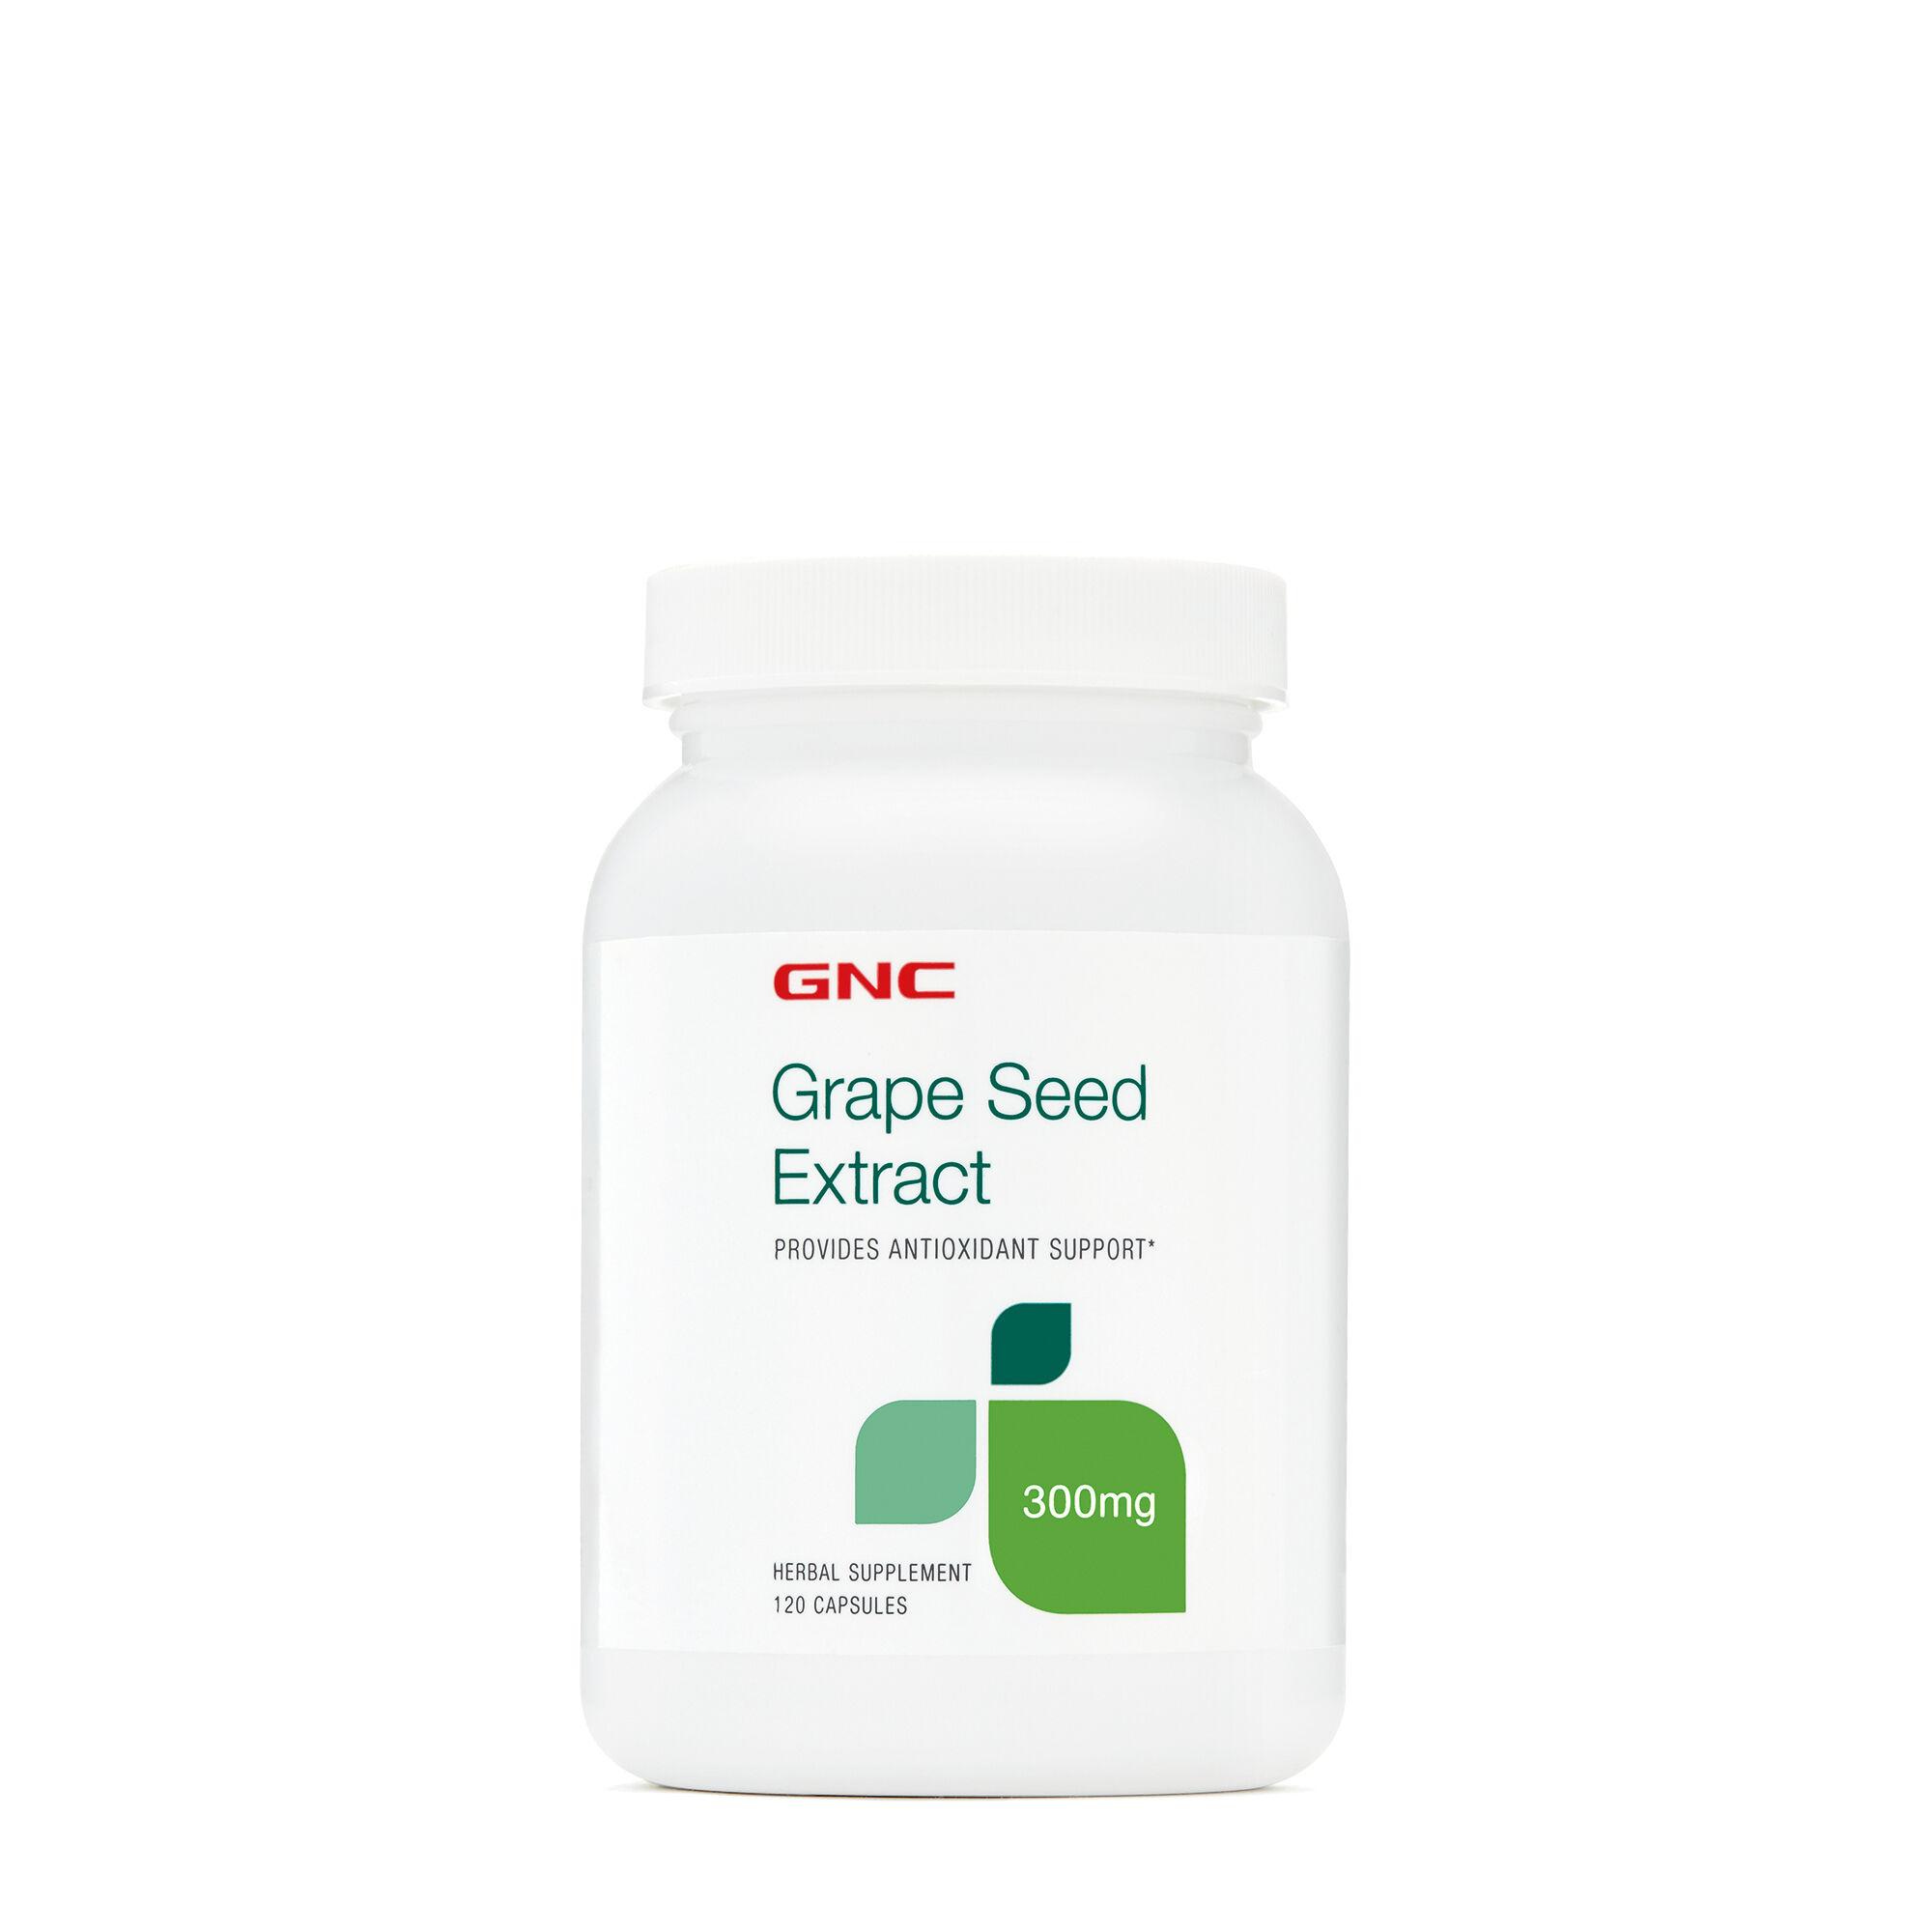 GNC GRAPE SEED EXTRACT